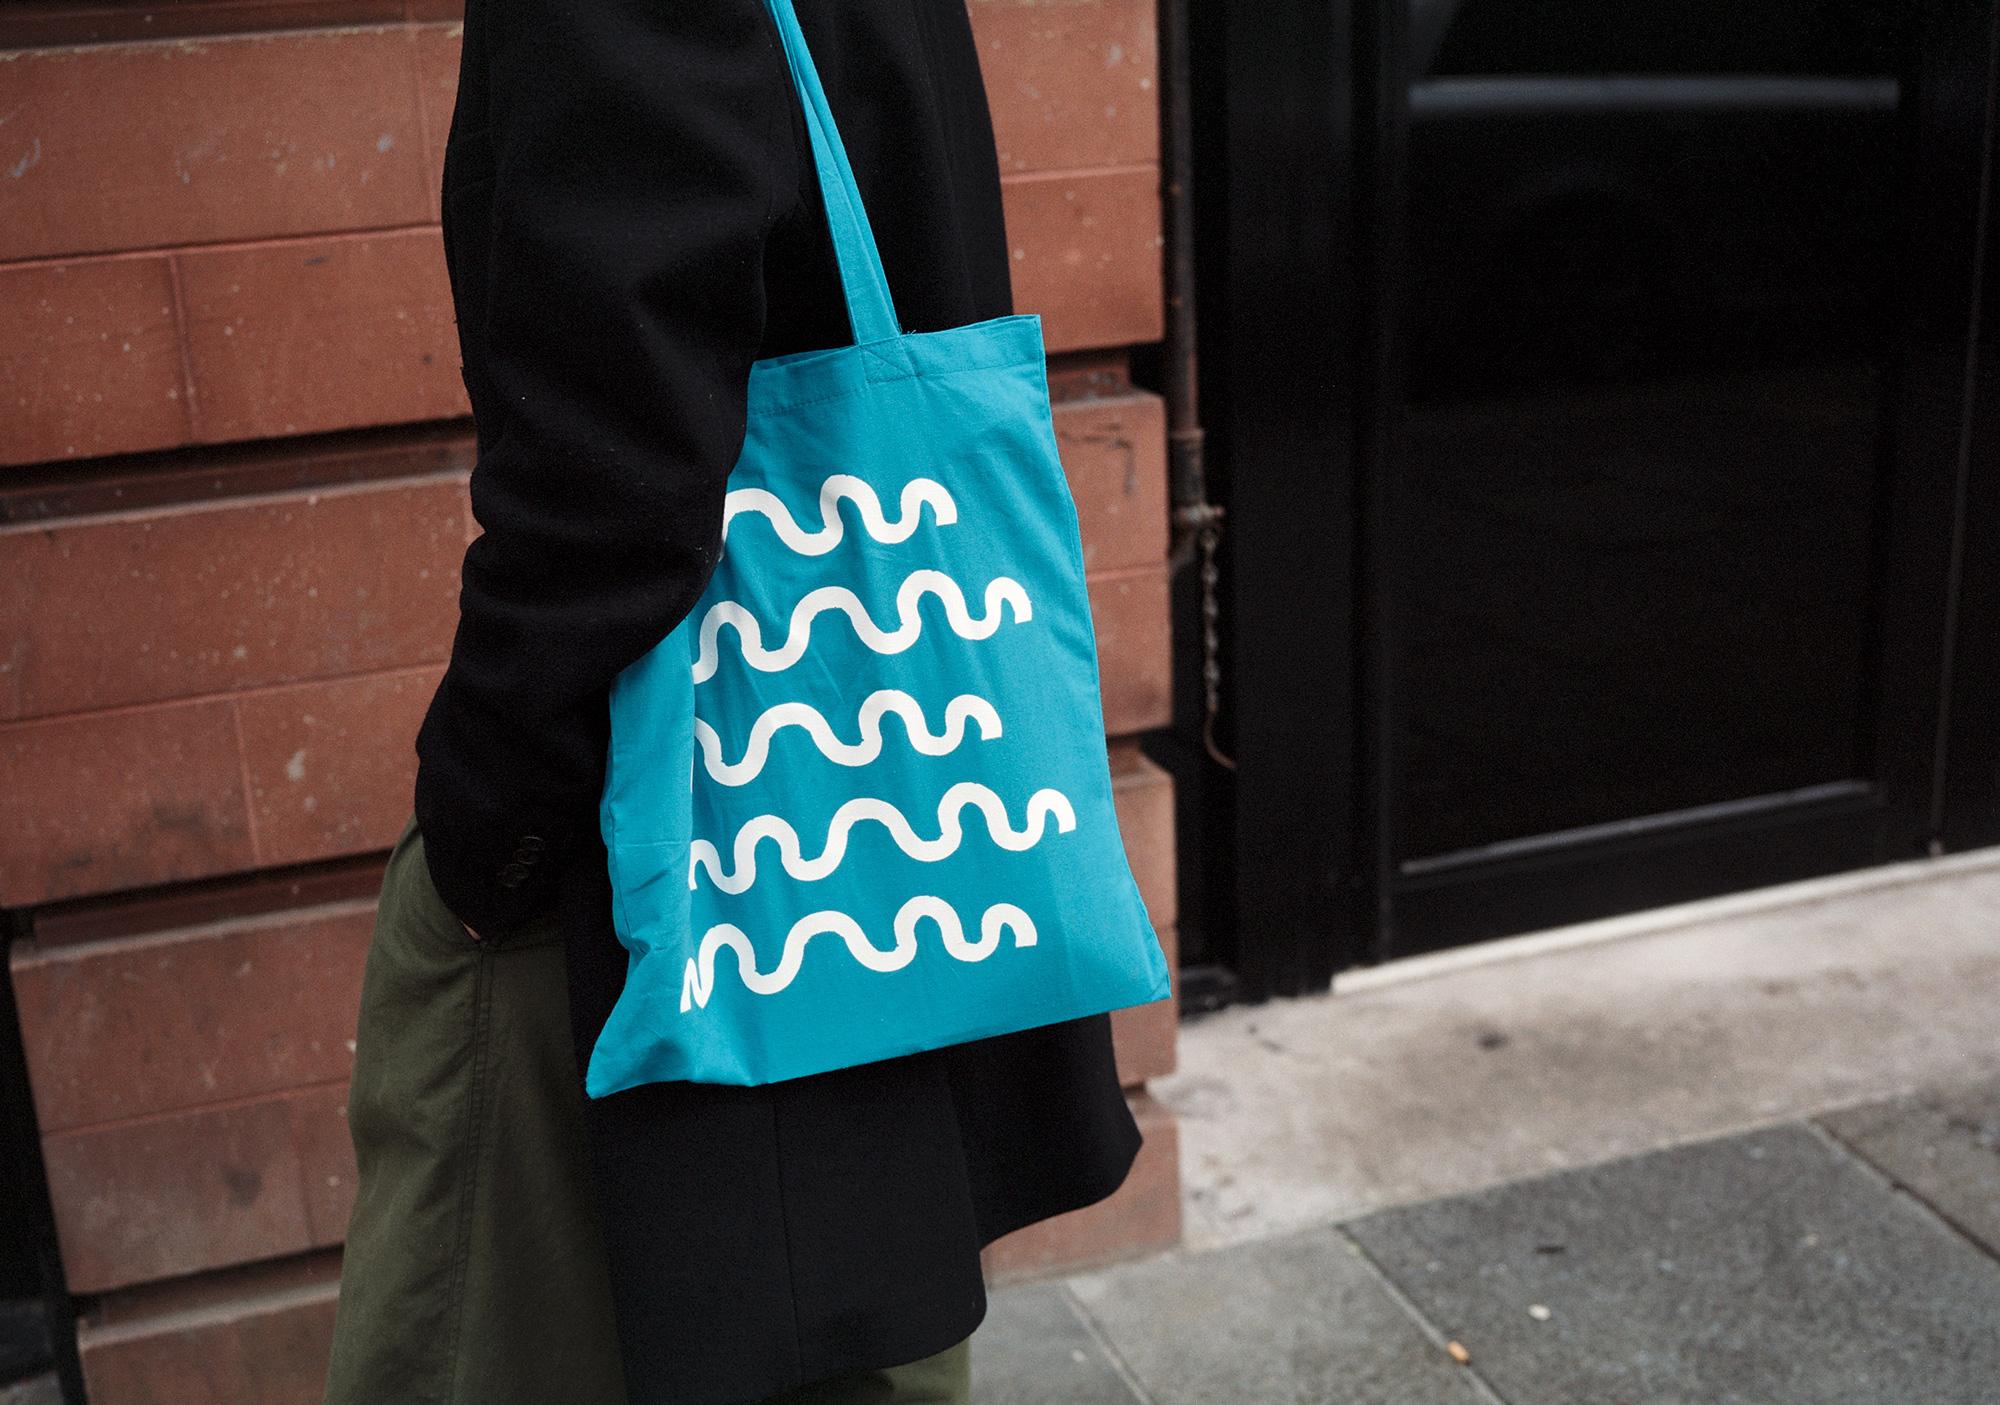 Kellenberger White's tote bag design for Glasgow International